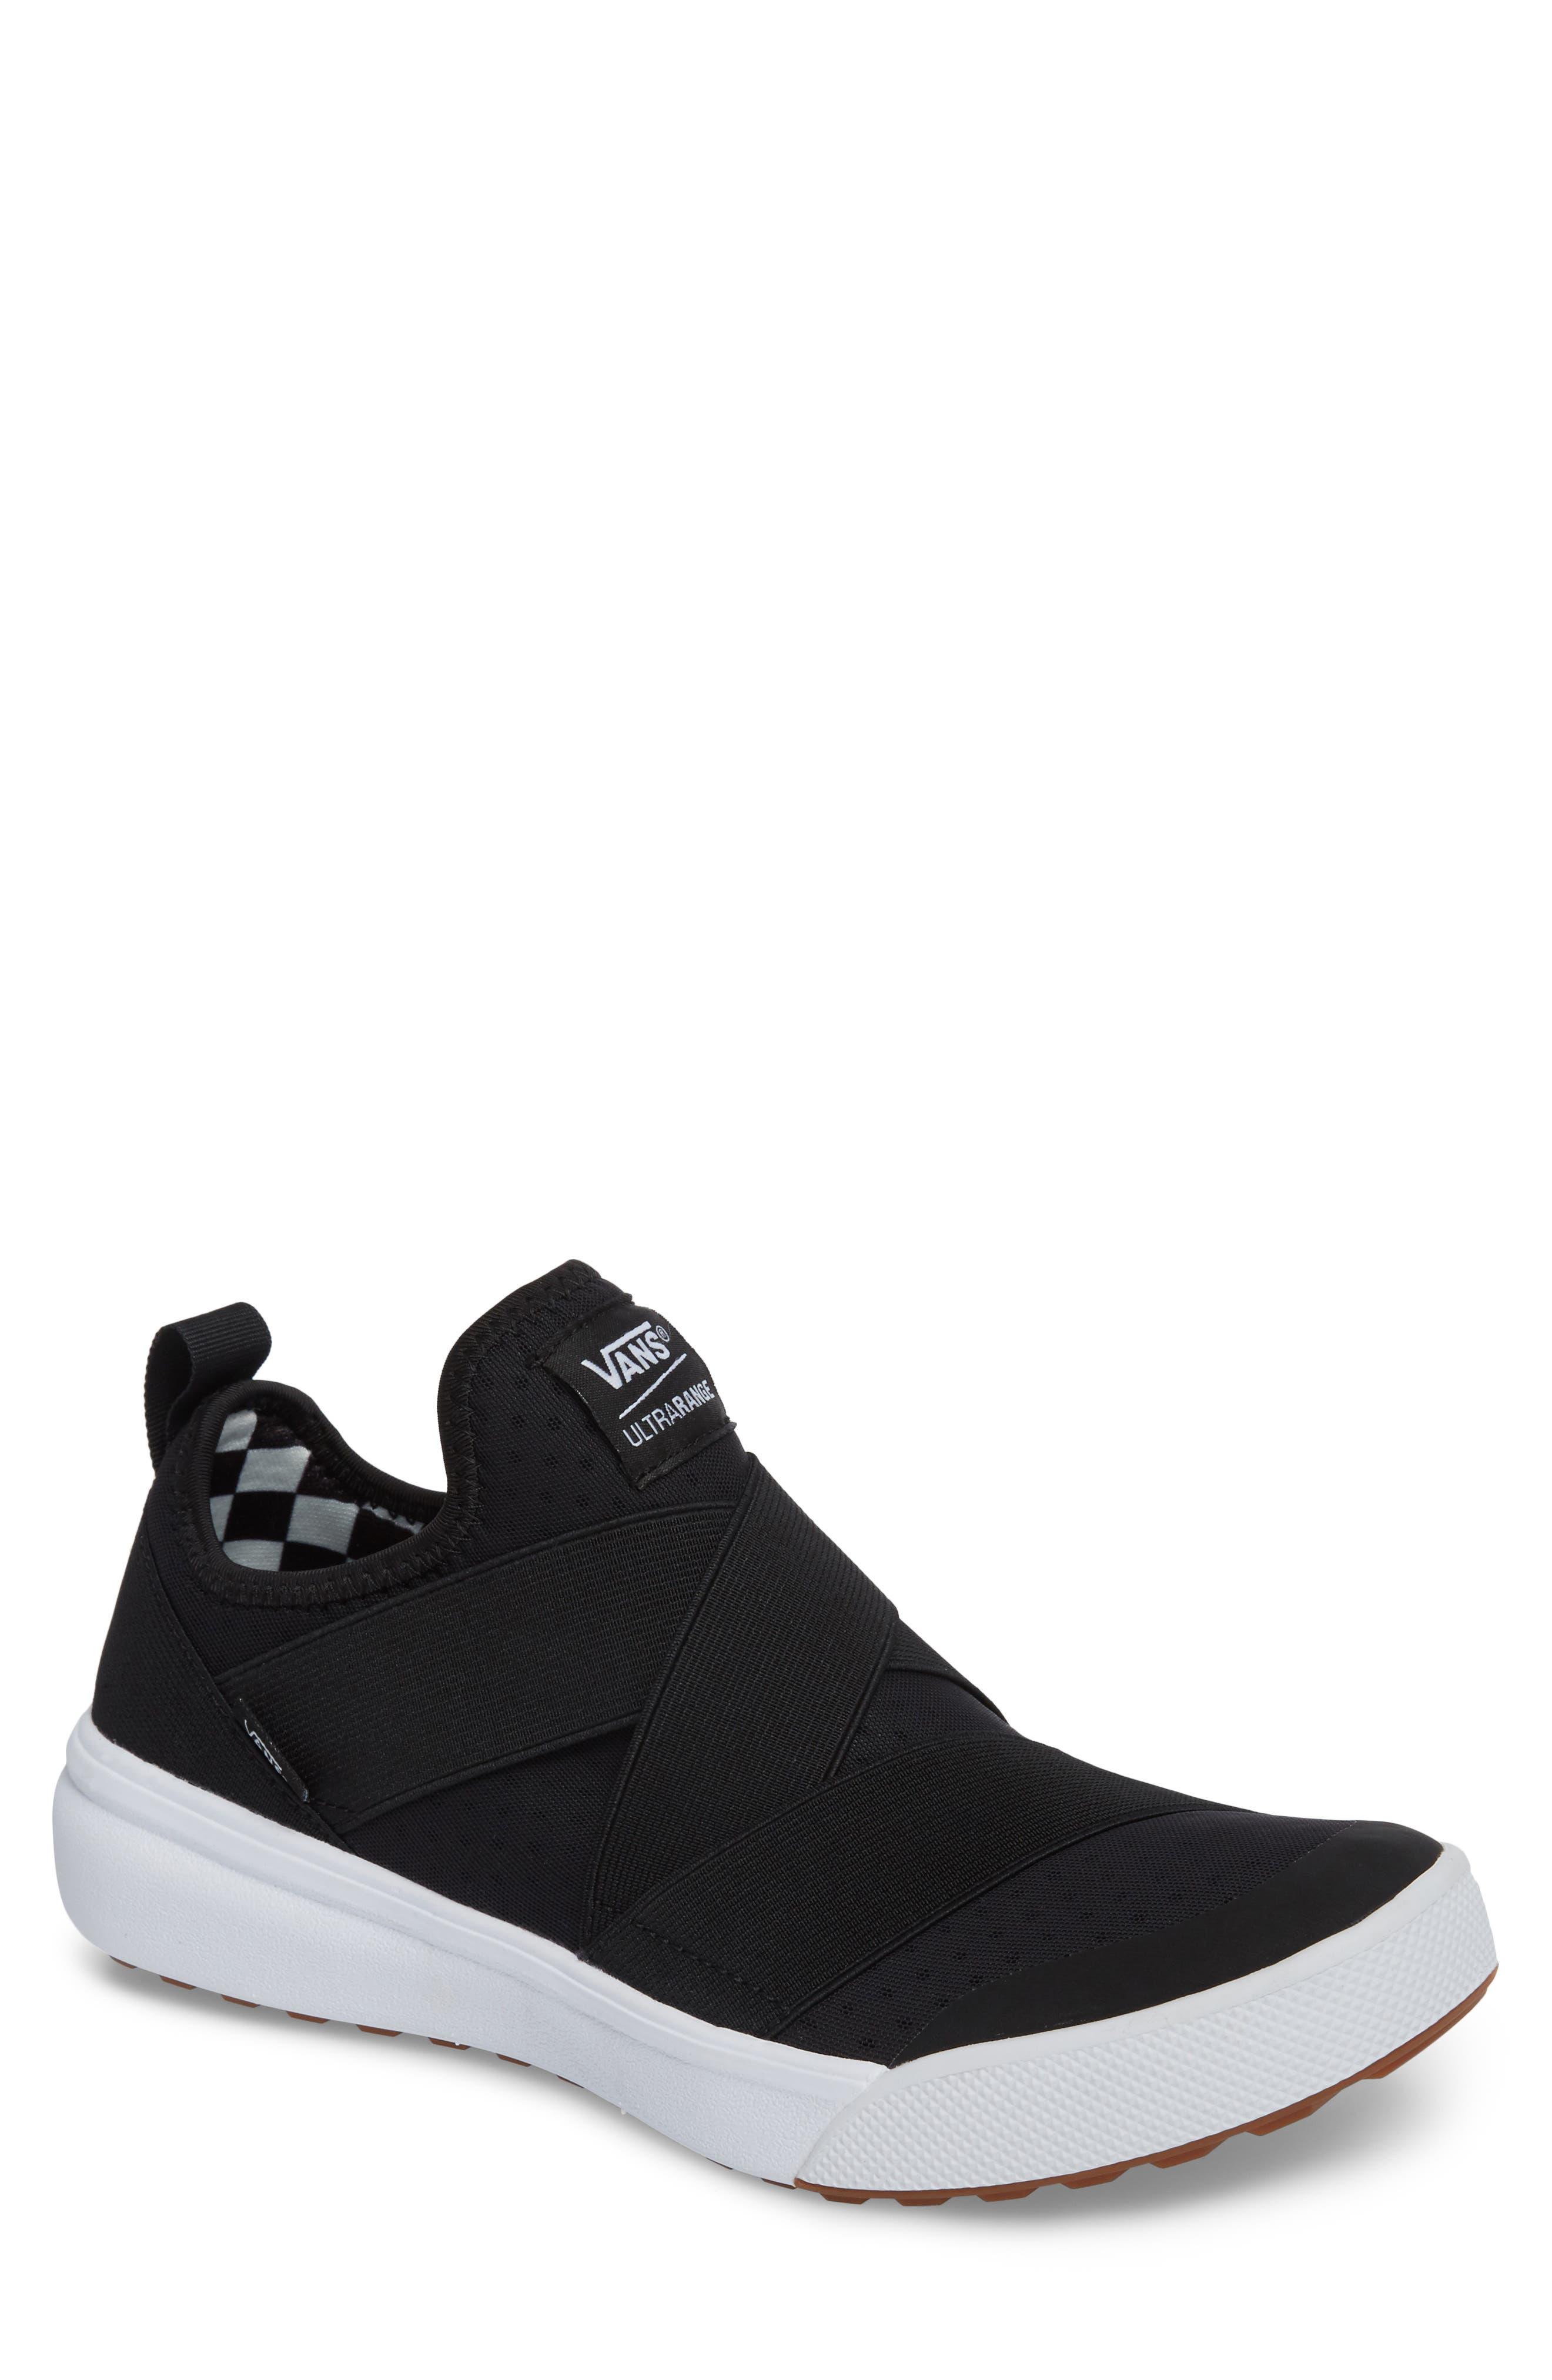 UltraRange Gore Slip-On Sneaker,                             Main thumbnail 1, color,                             BLACK